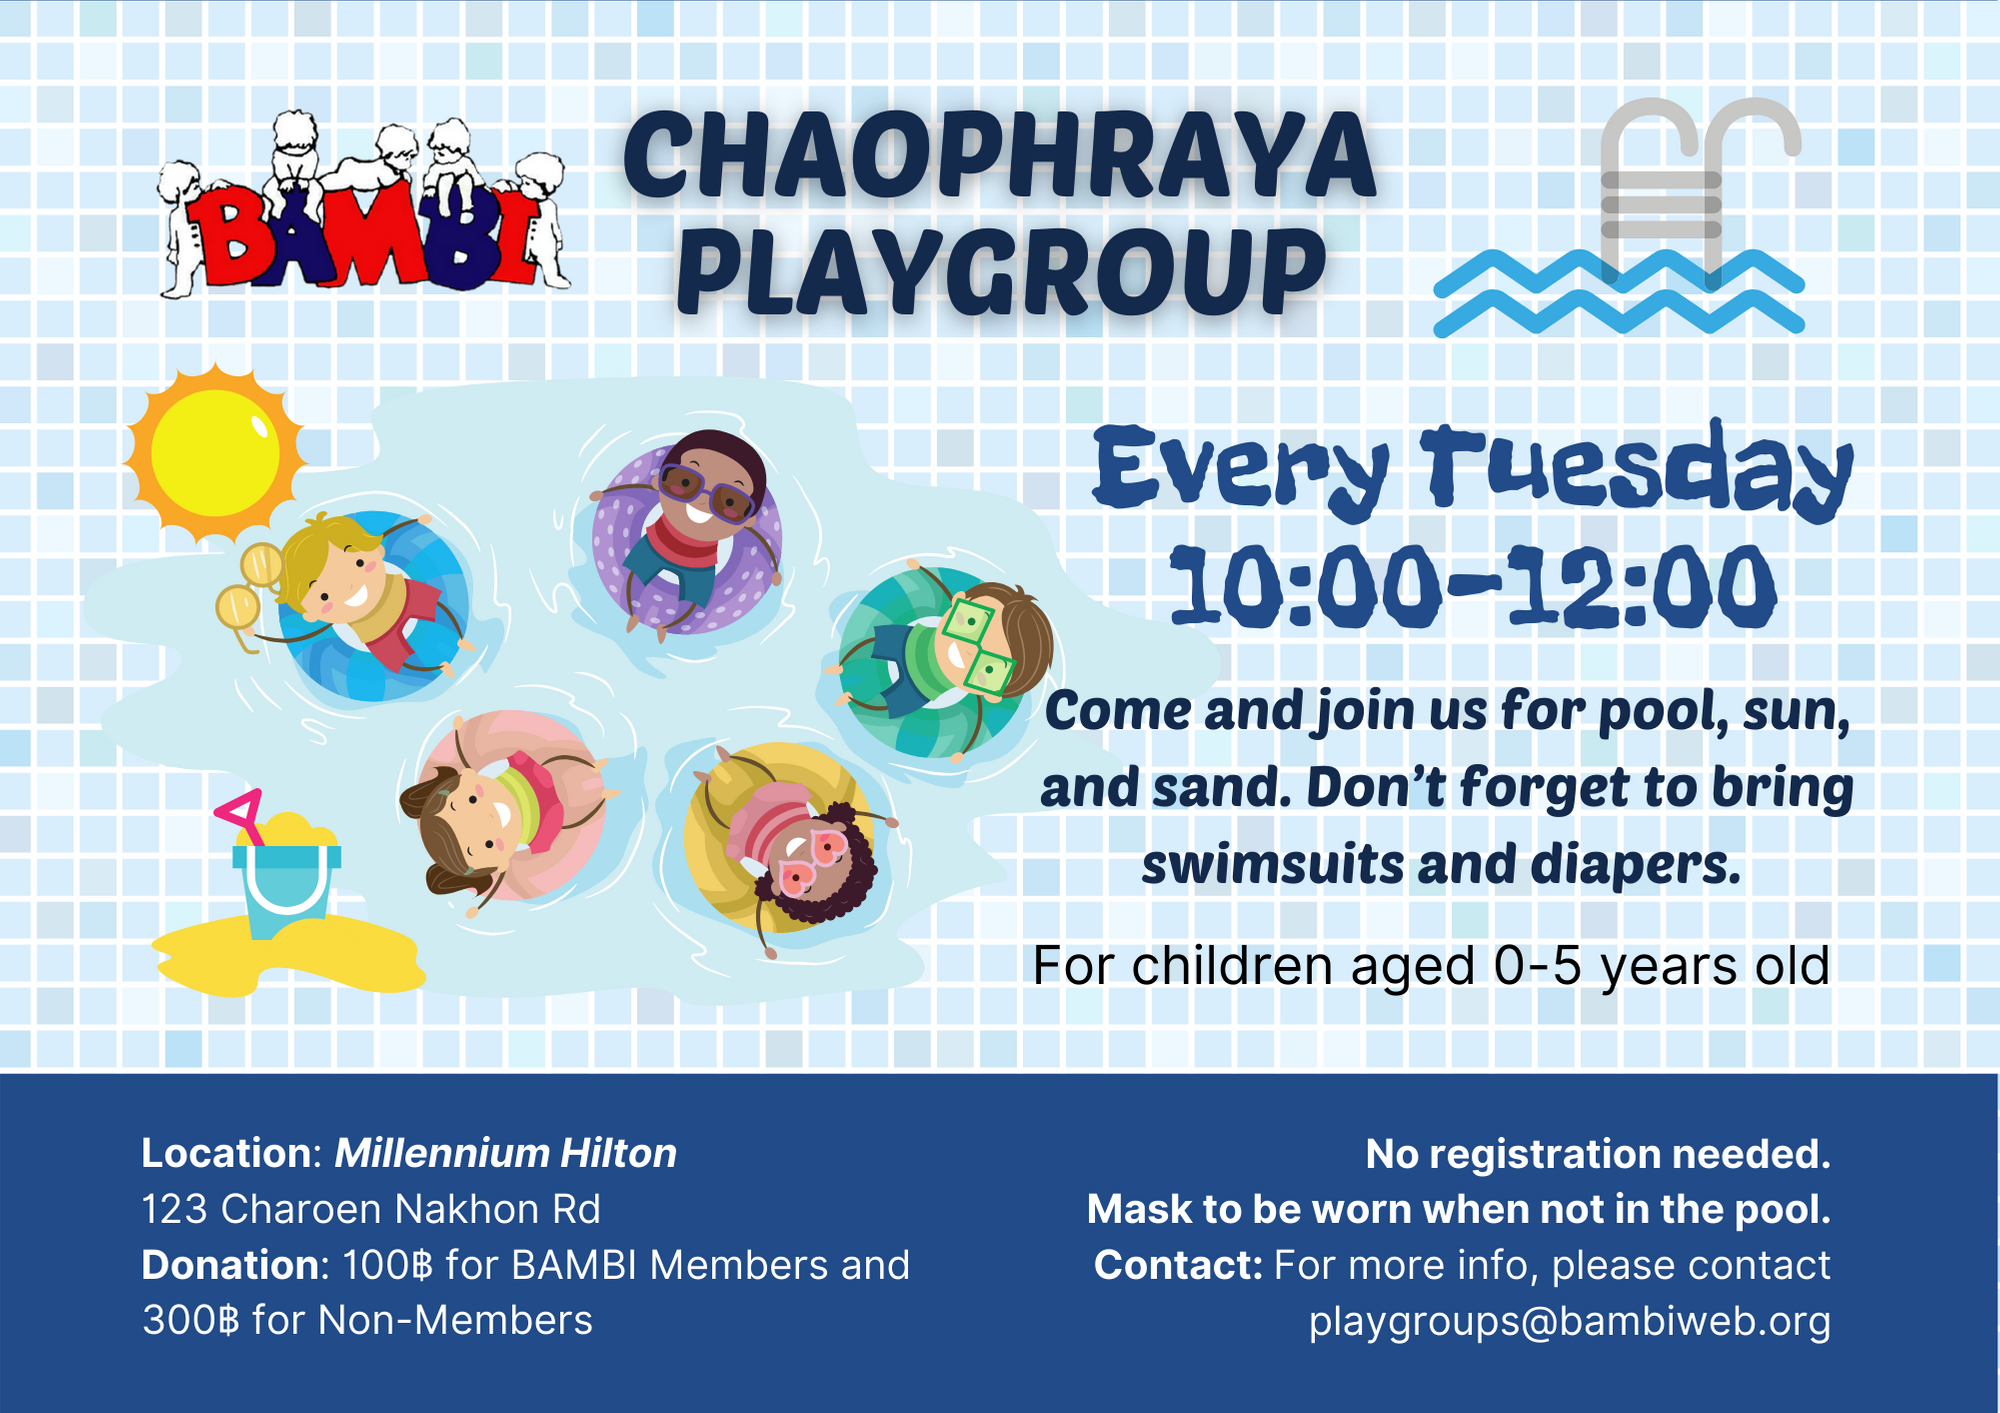 Chaophraya Playgroup